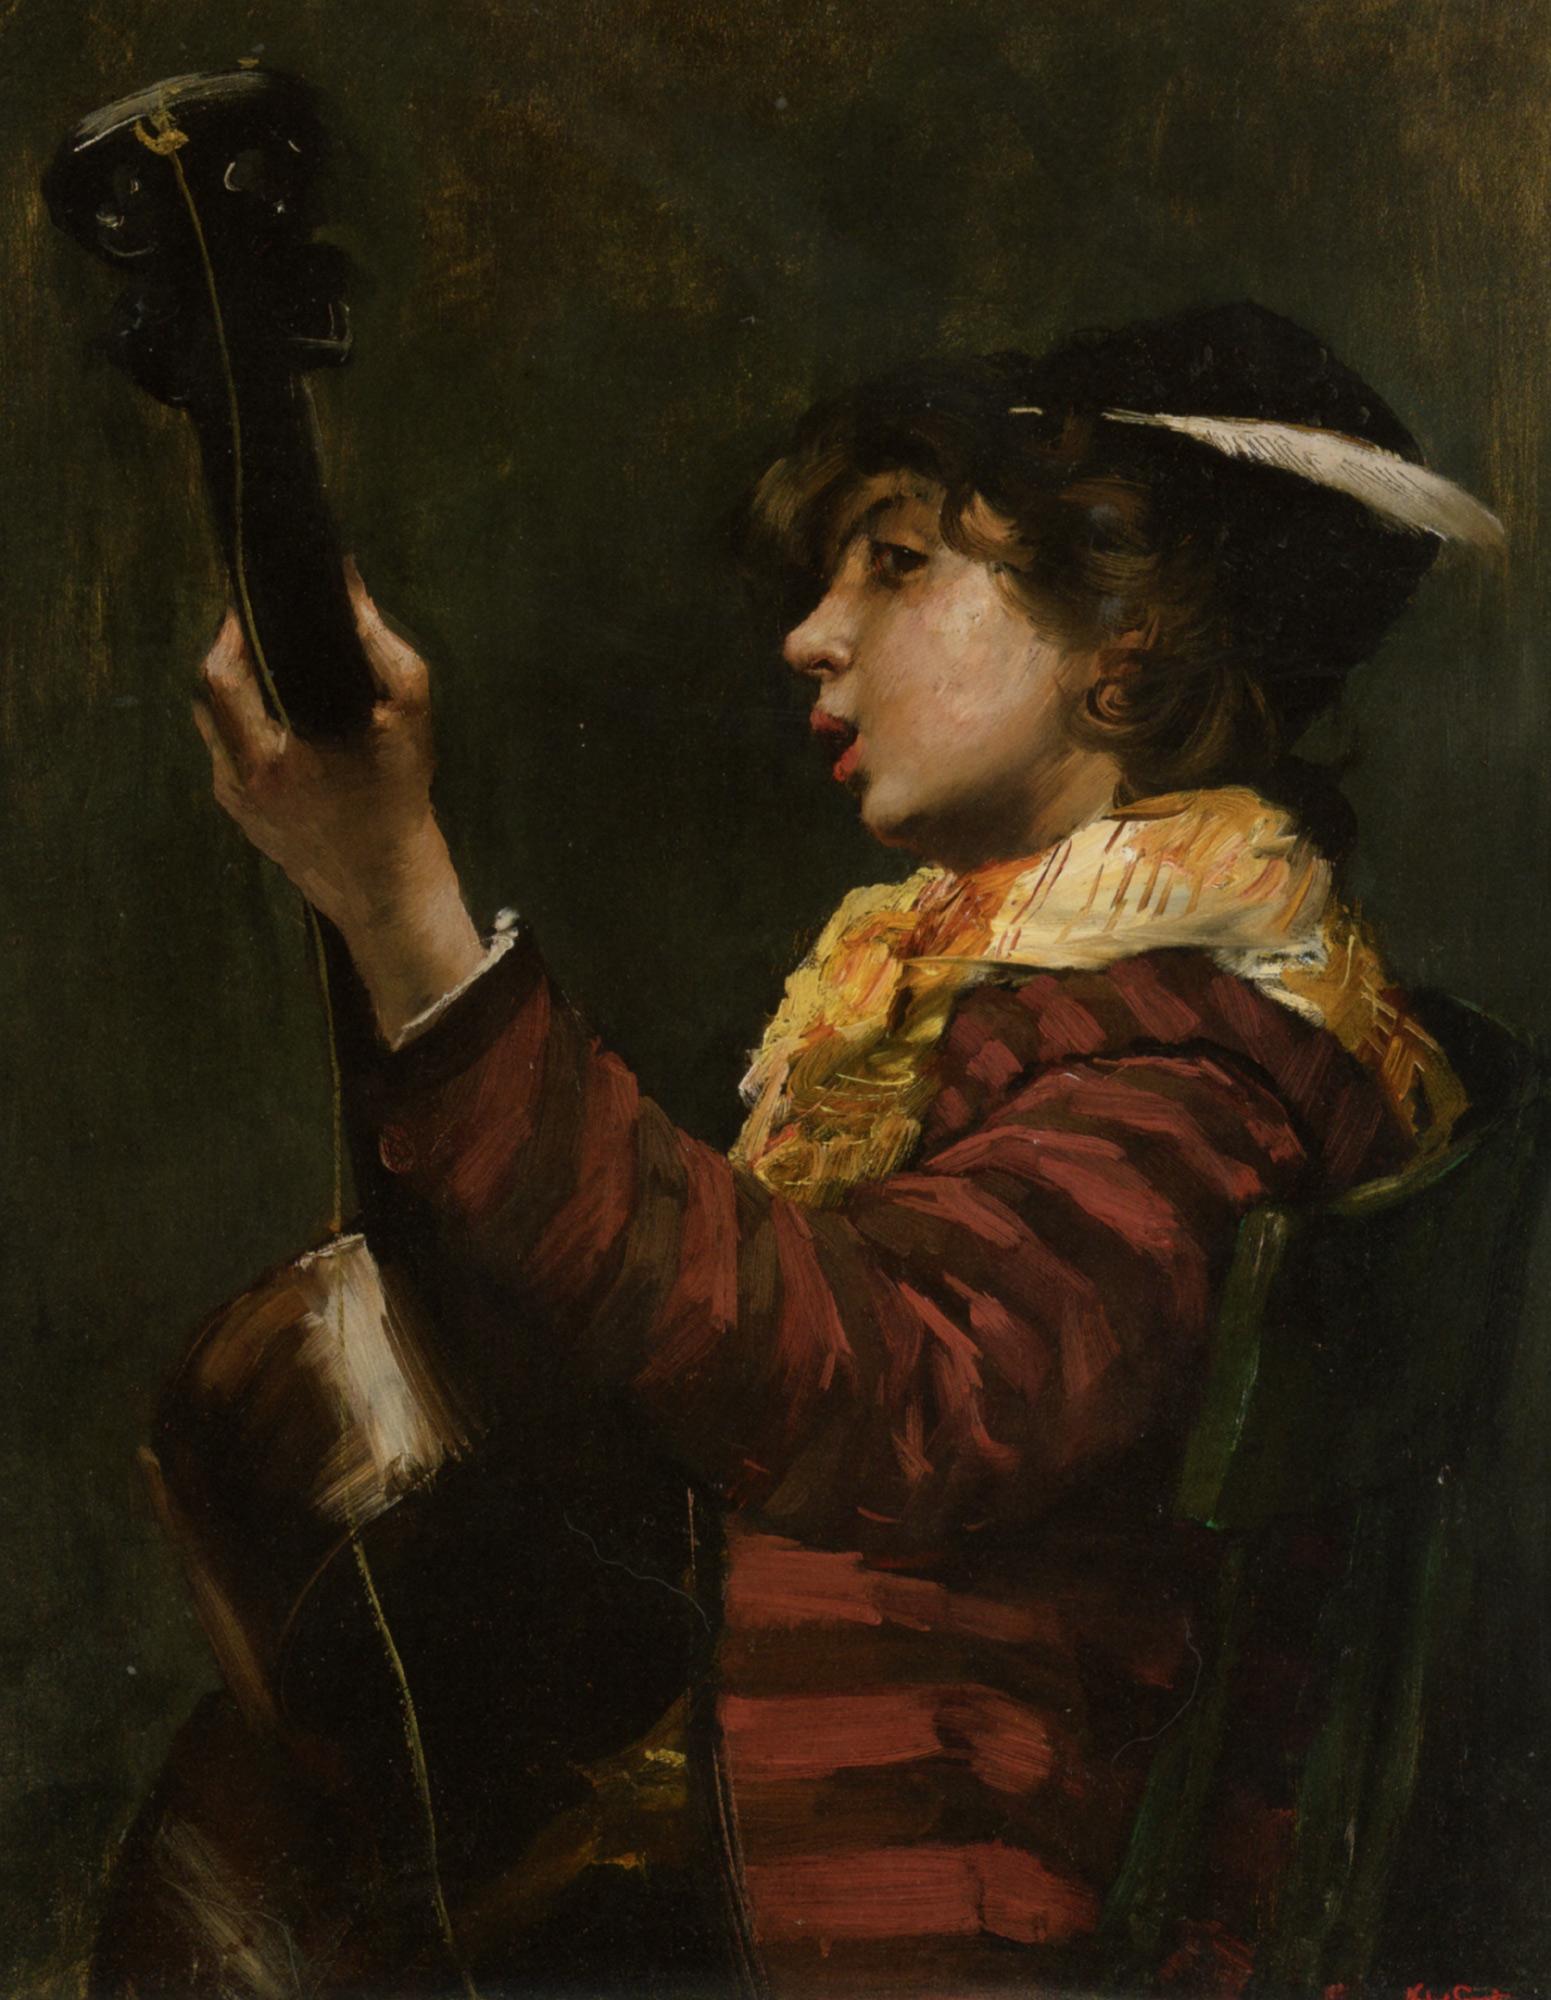 The Guitarist :: Norbert Goeneutte - Portraits of young boys ôîòî